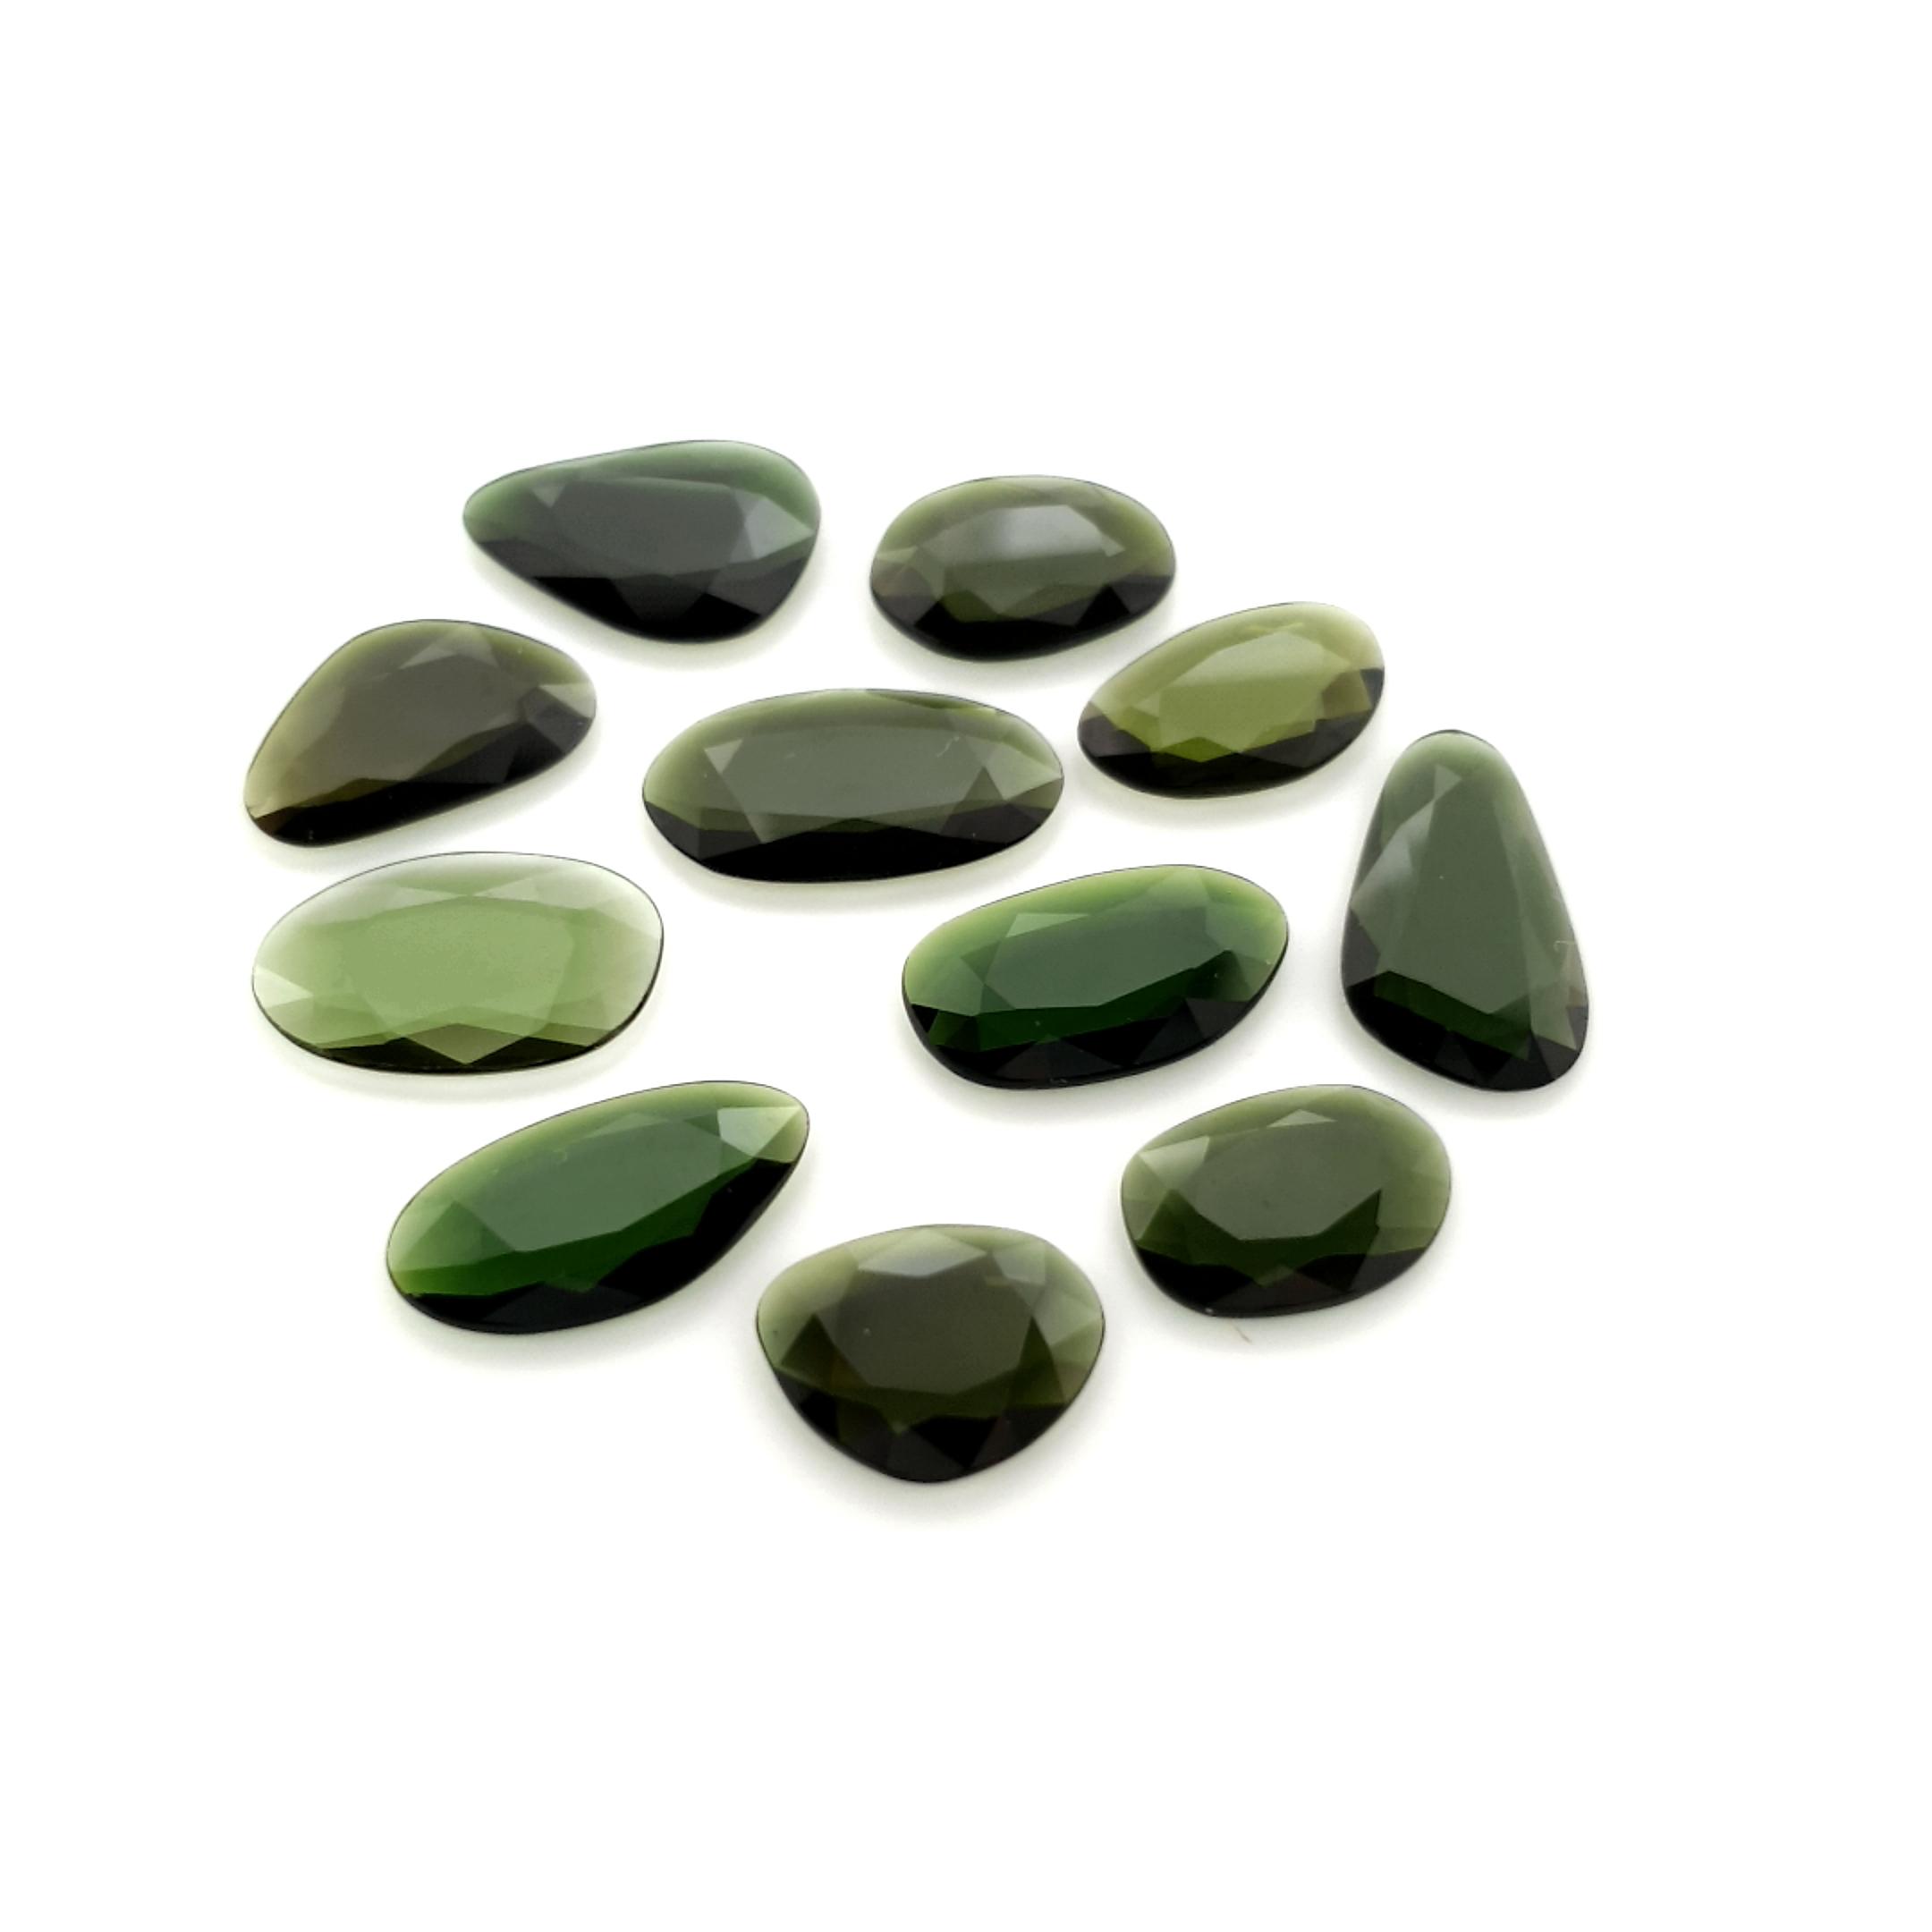 2,00-3,00ct.size Imperial Green Tourmalin DoubleRoseCut TMK18C16 ClaudiaHamann__2021-02-11-14-40-31